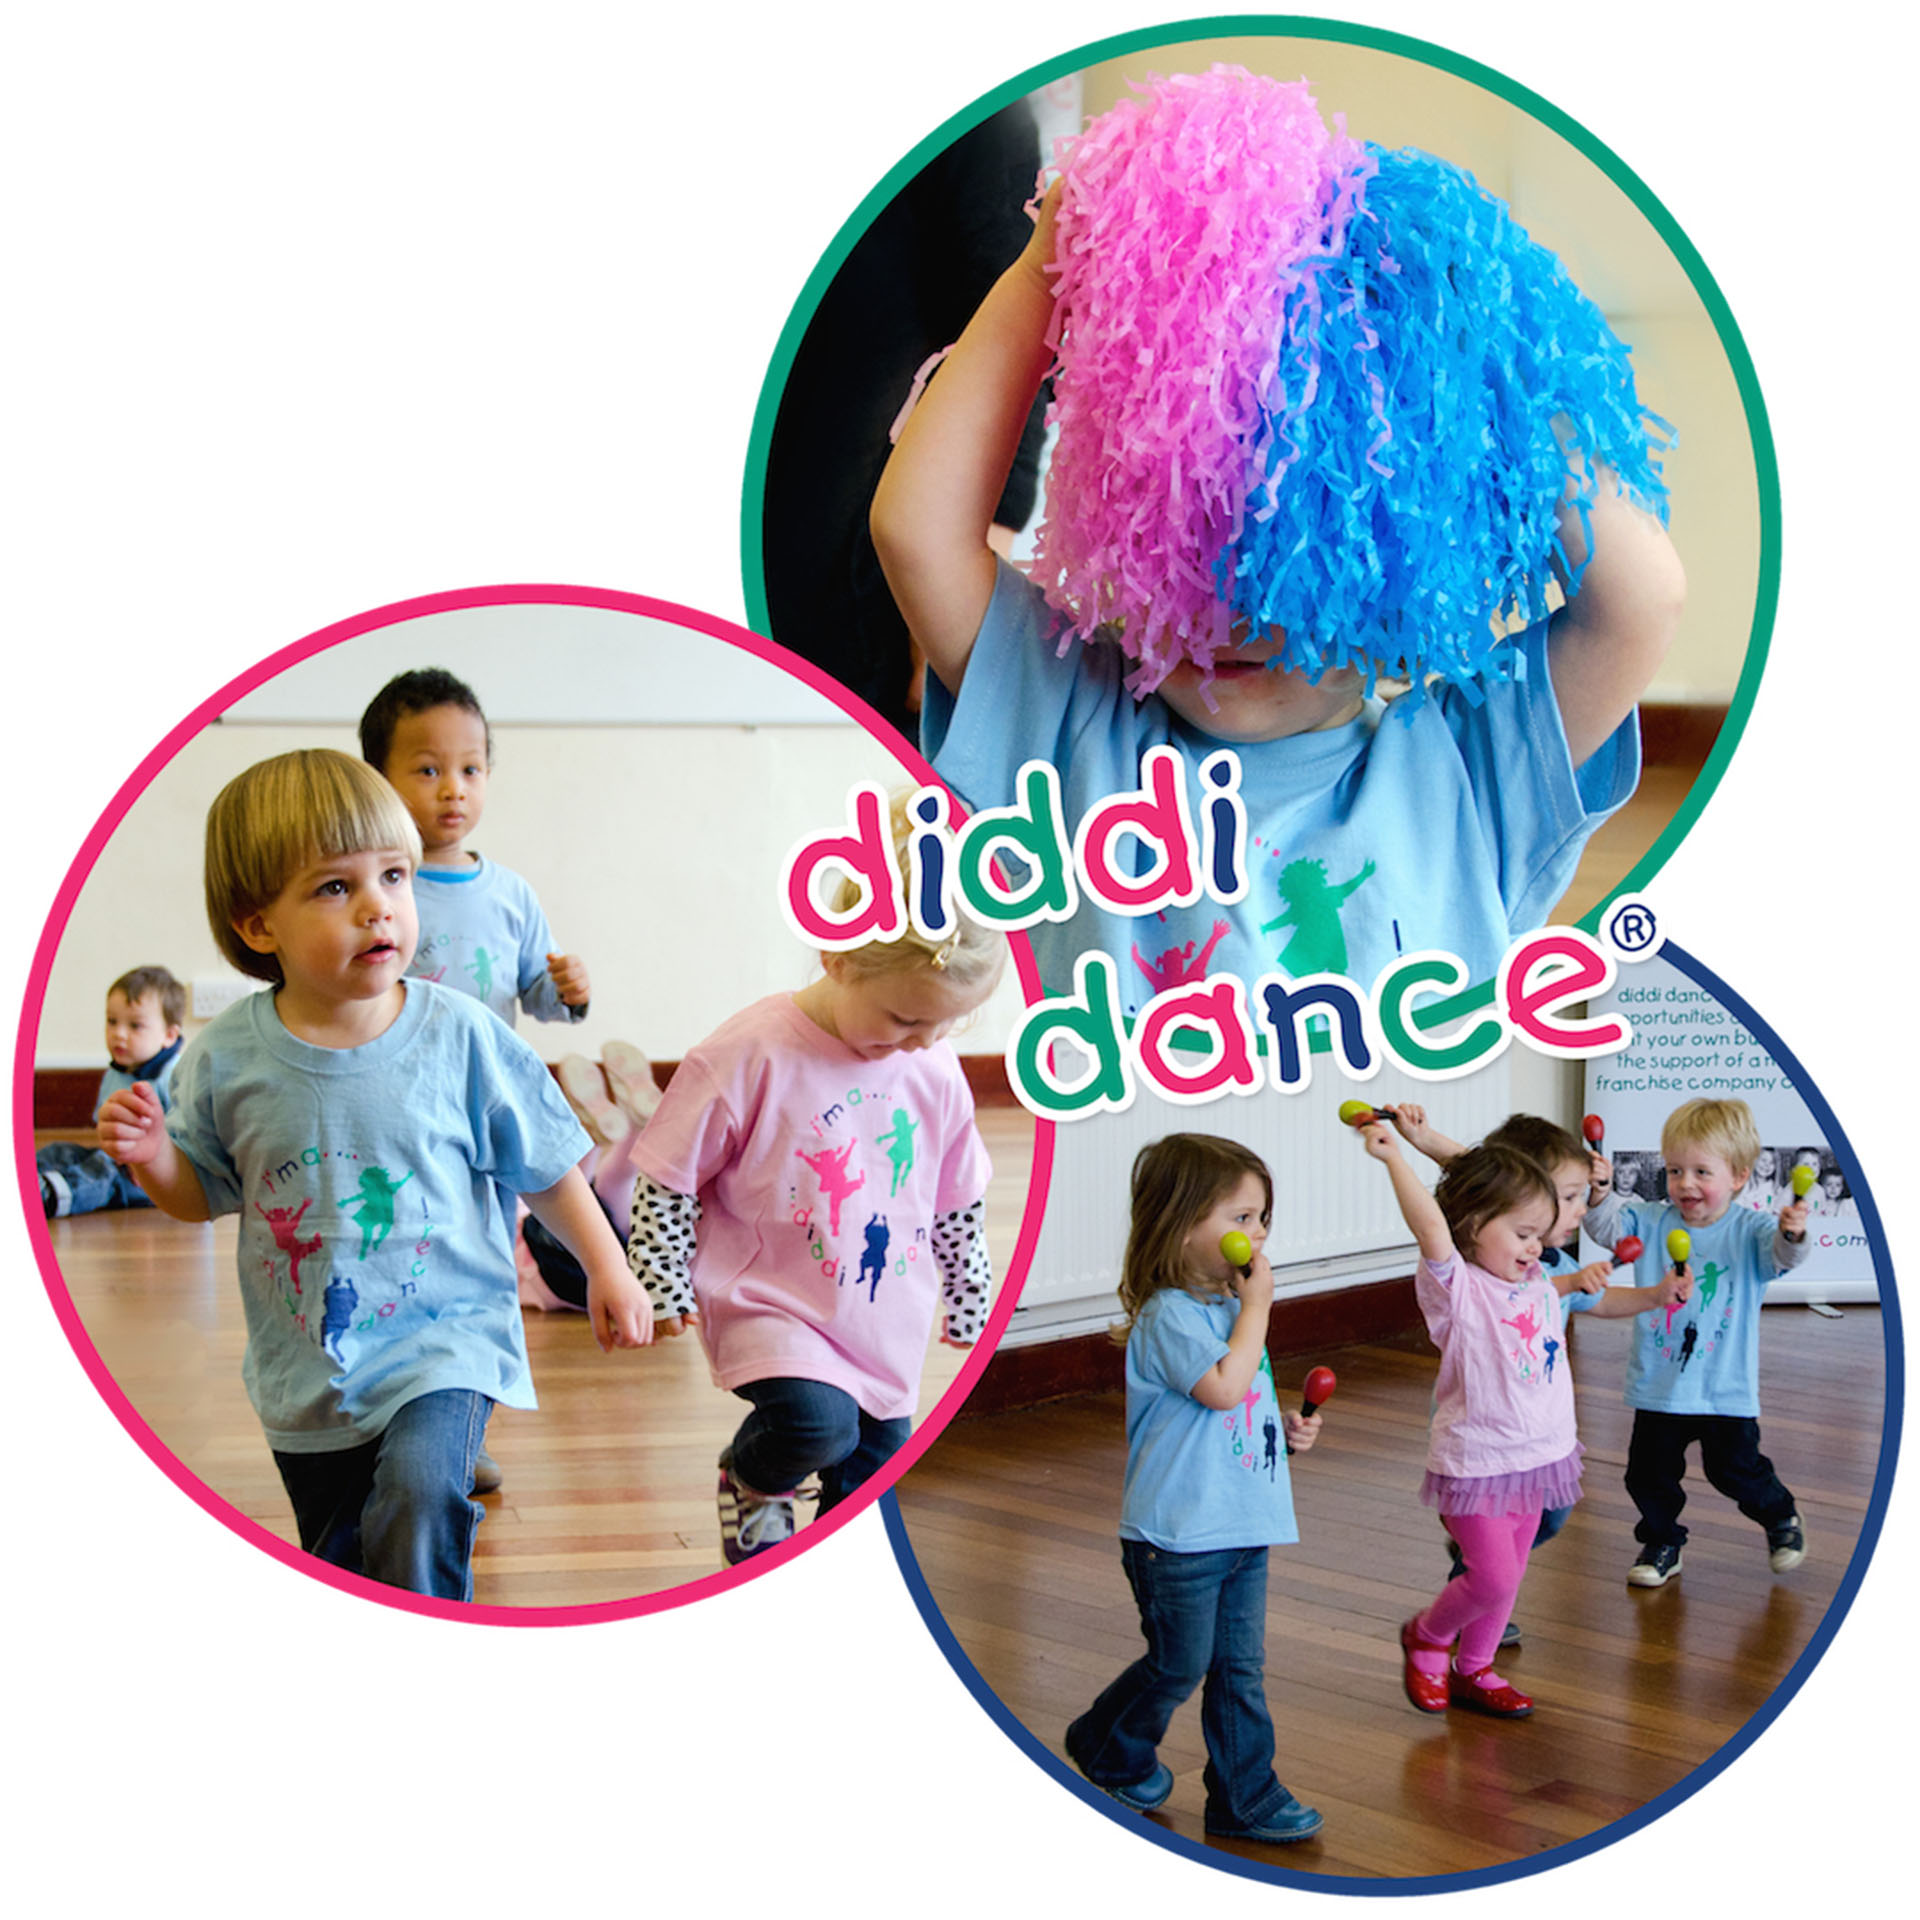 diddi dance Bury St Edmunds, Forest Heath & Mid Suffolk's logo